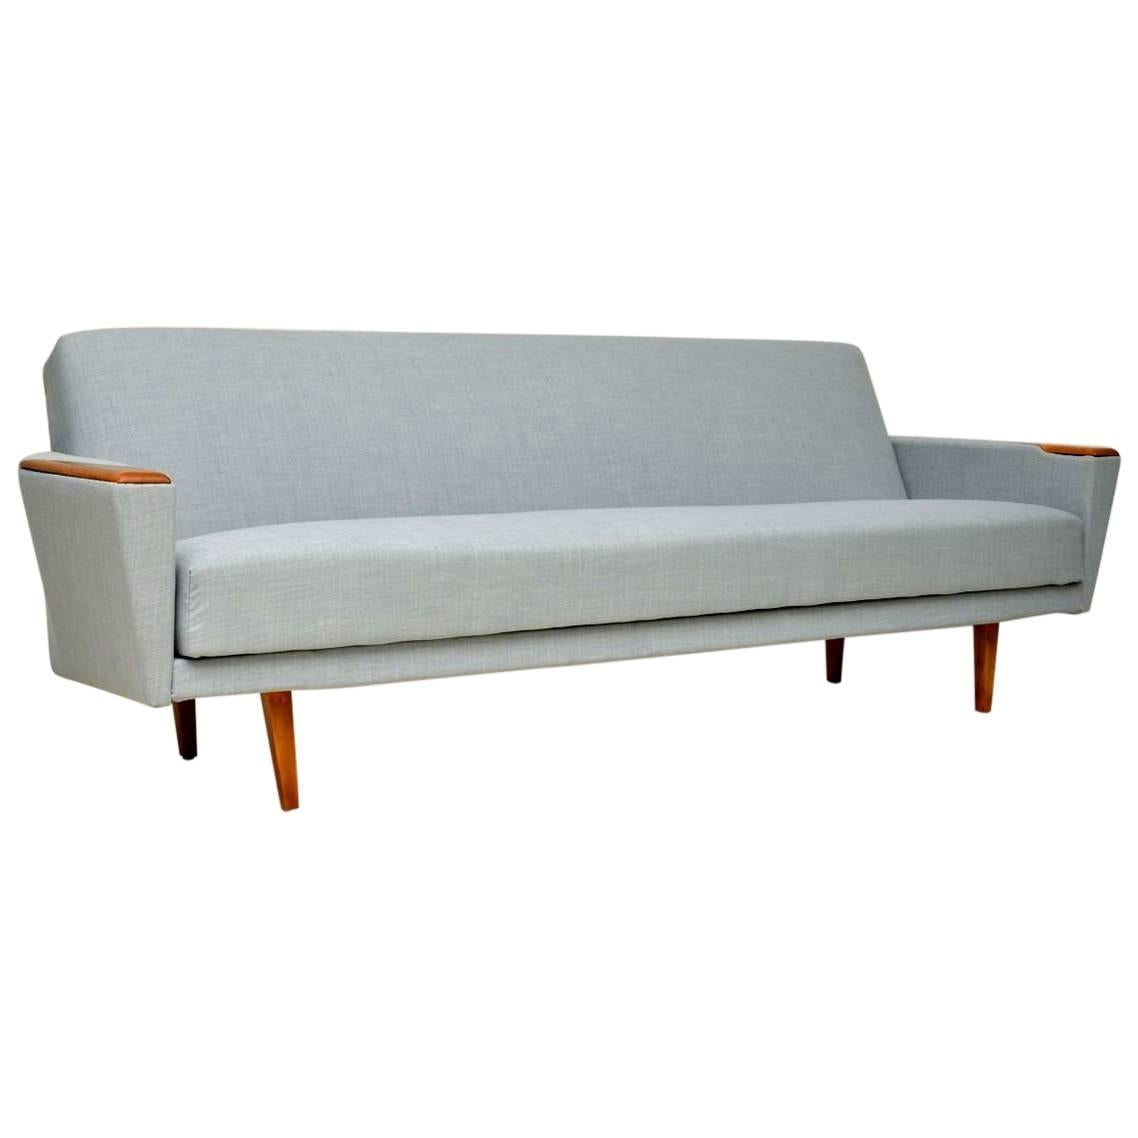 1950s Vintage Sofa Bed For Sale